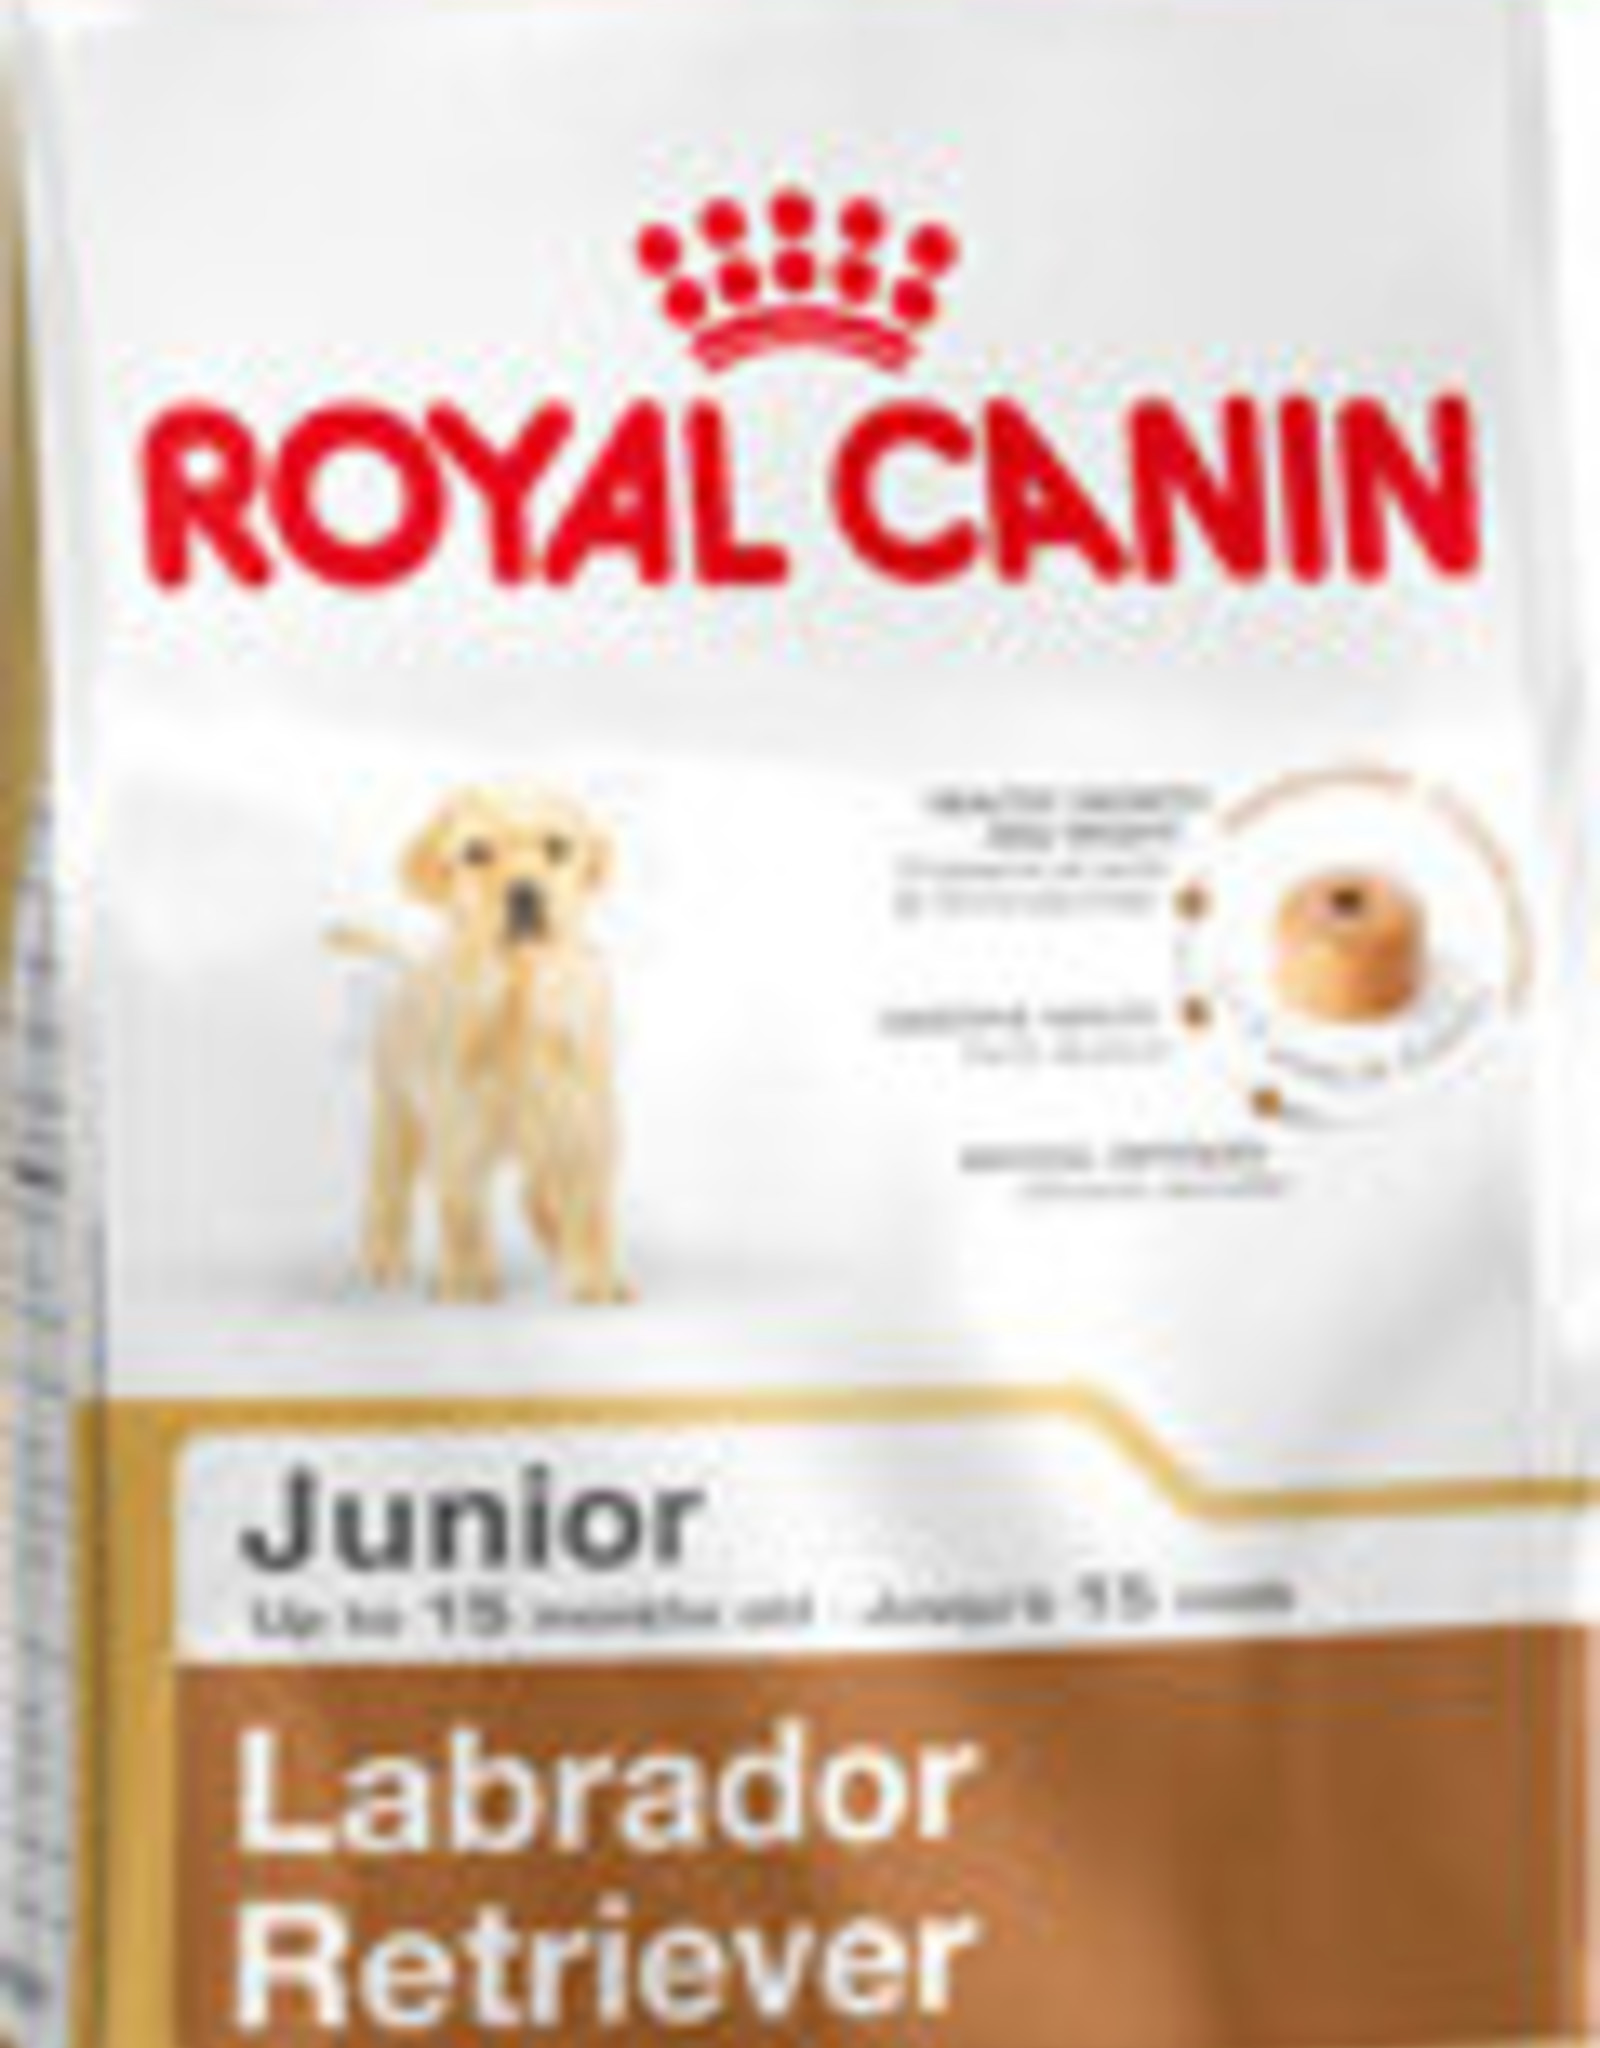 Royal Canin Royal Canin Bhn Labrador Retriever Junior 3kg